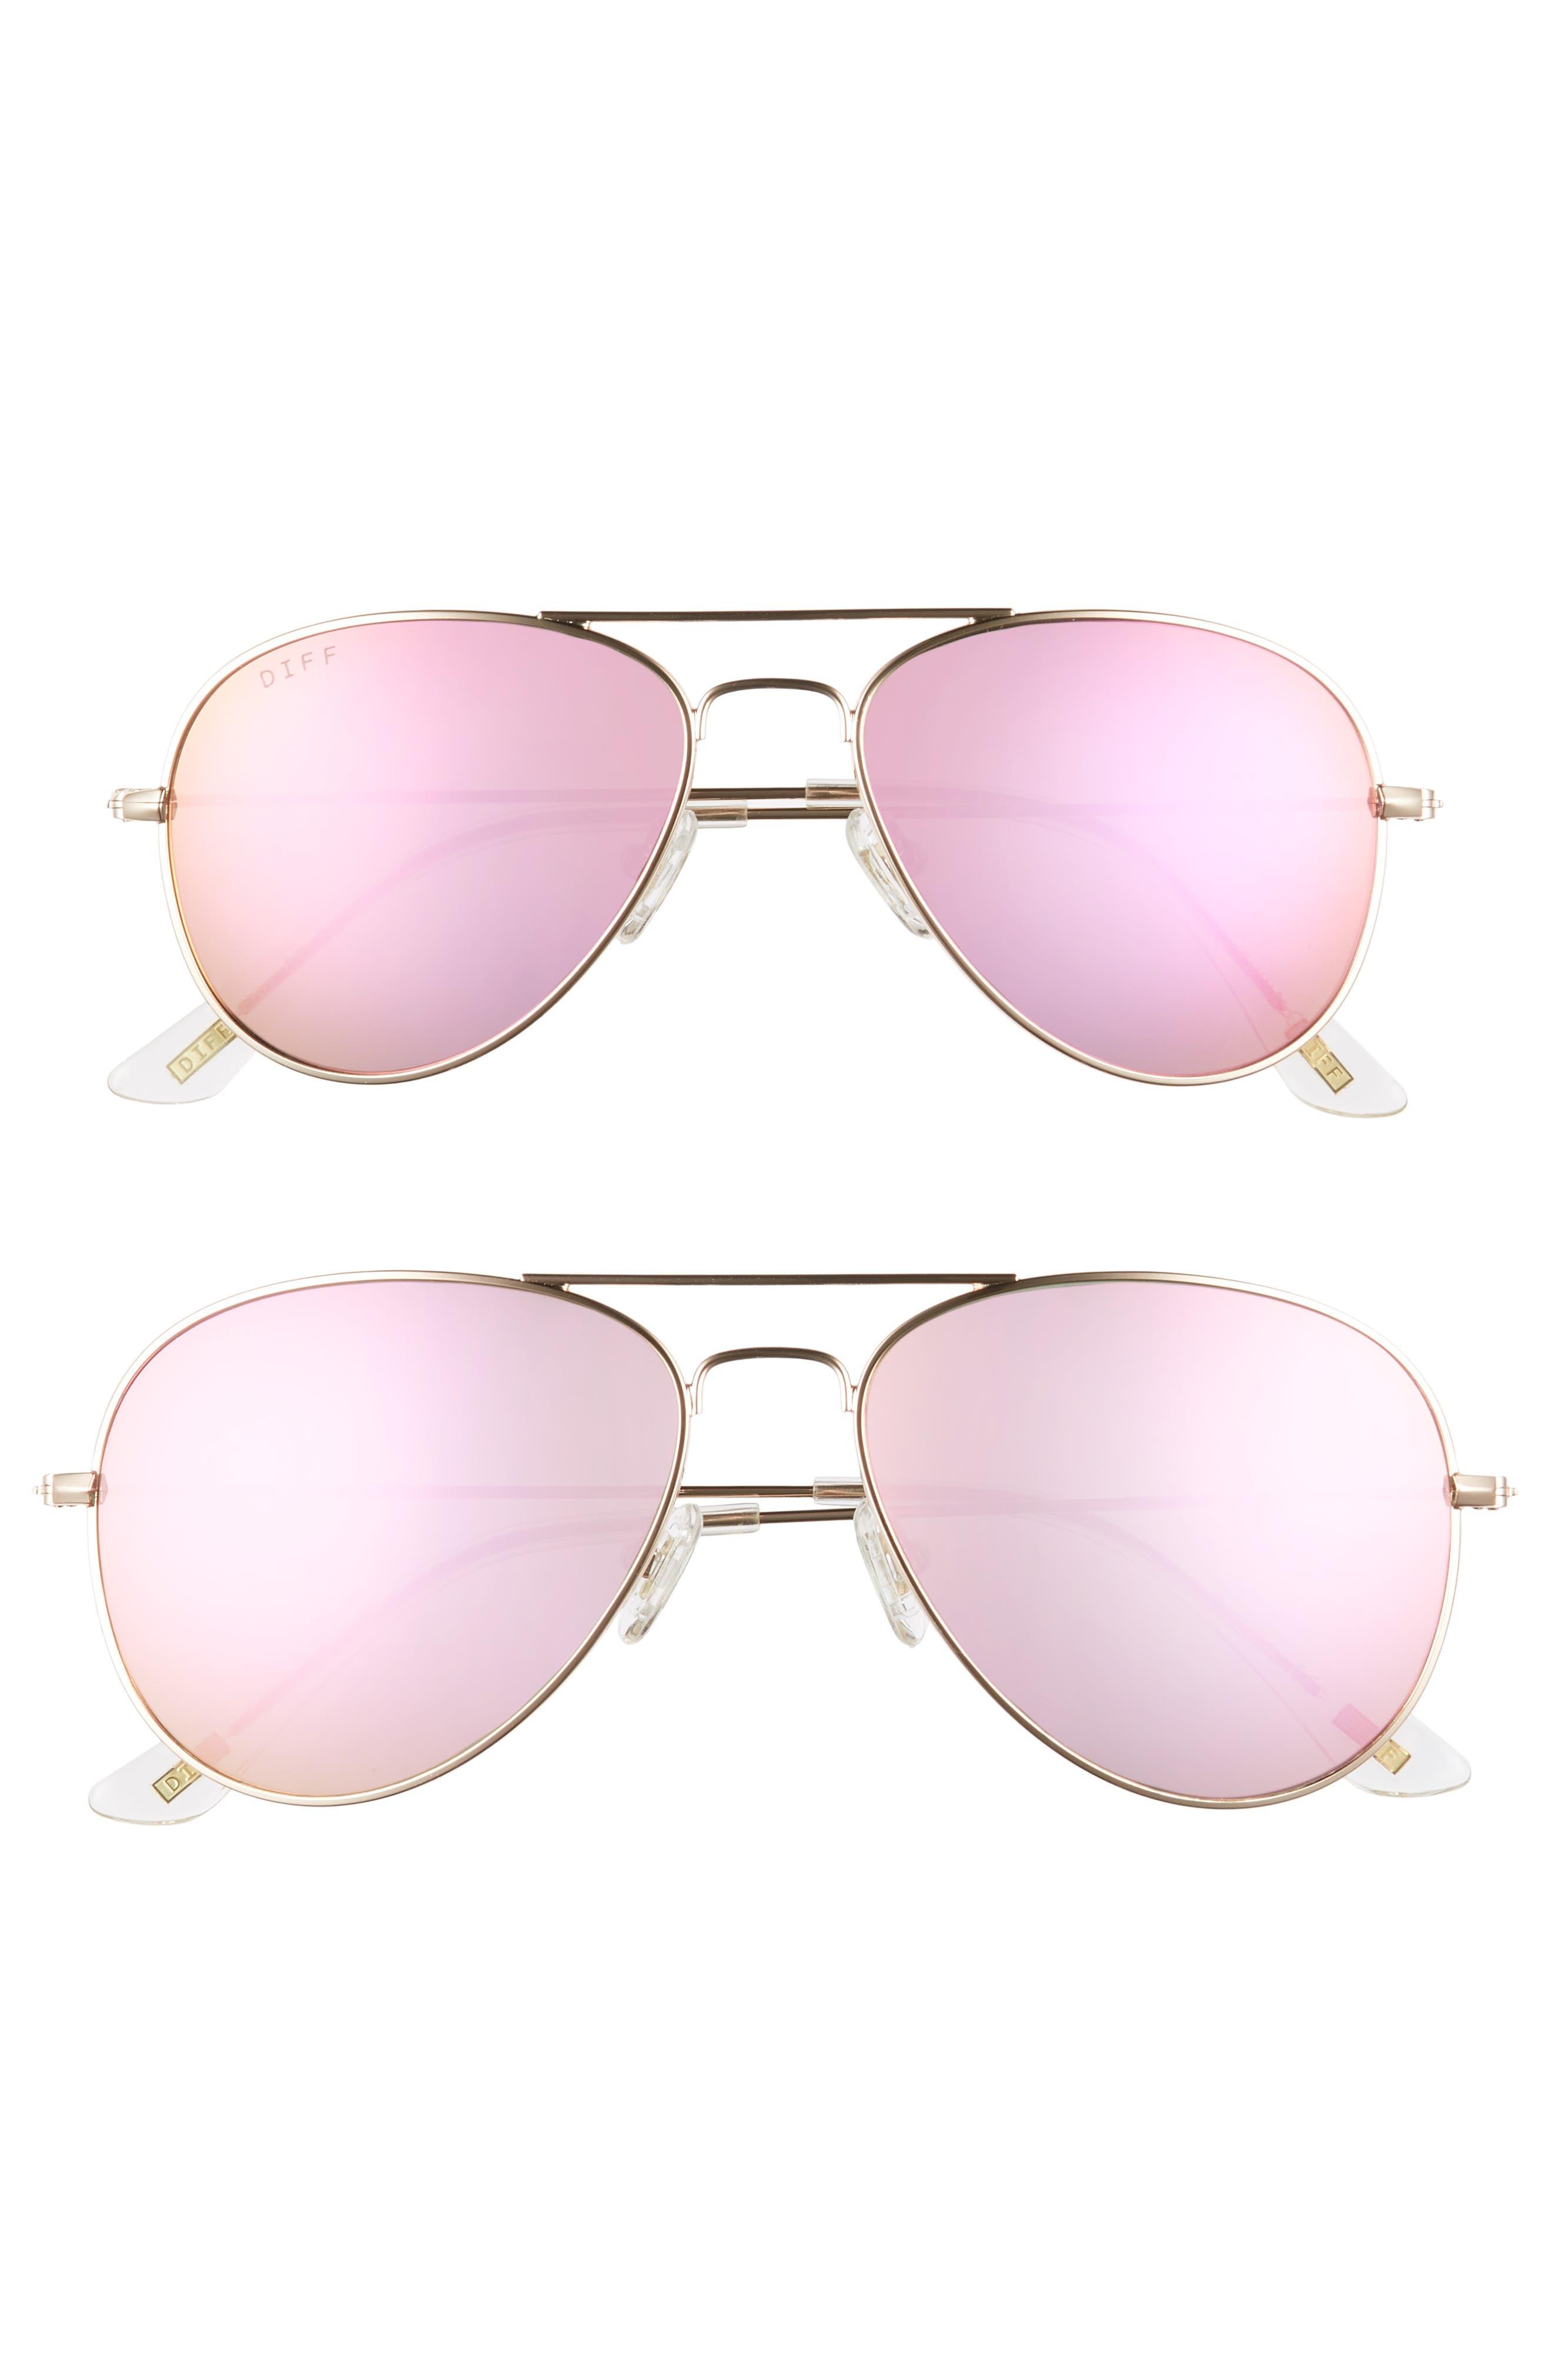 DIFF Mommy & Me Cruz 2-Pack Aviator Sunglasses ($135 Value)